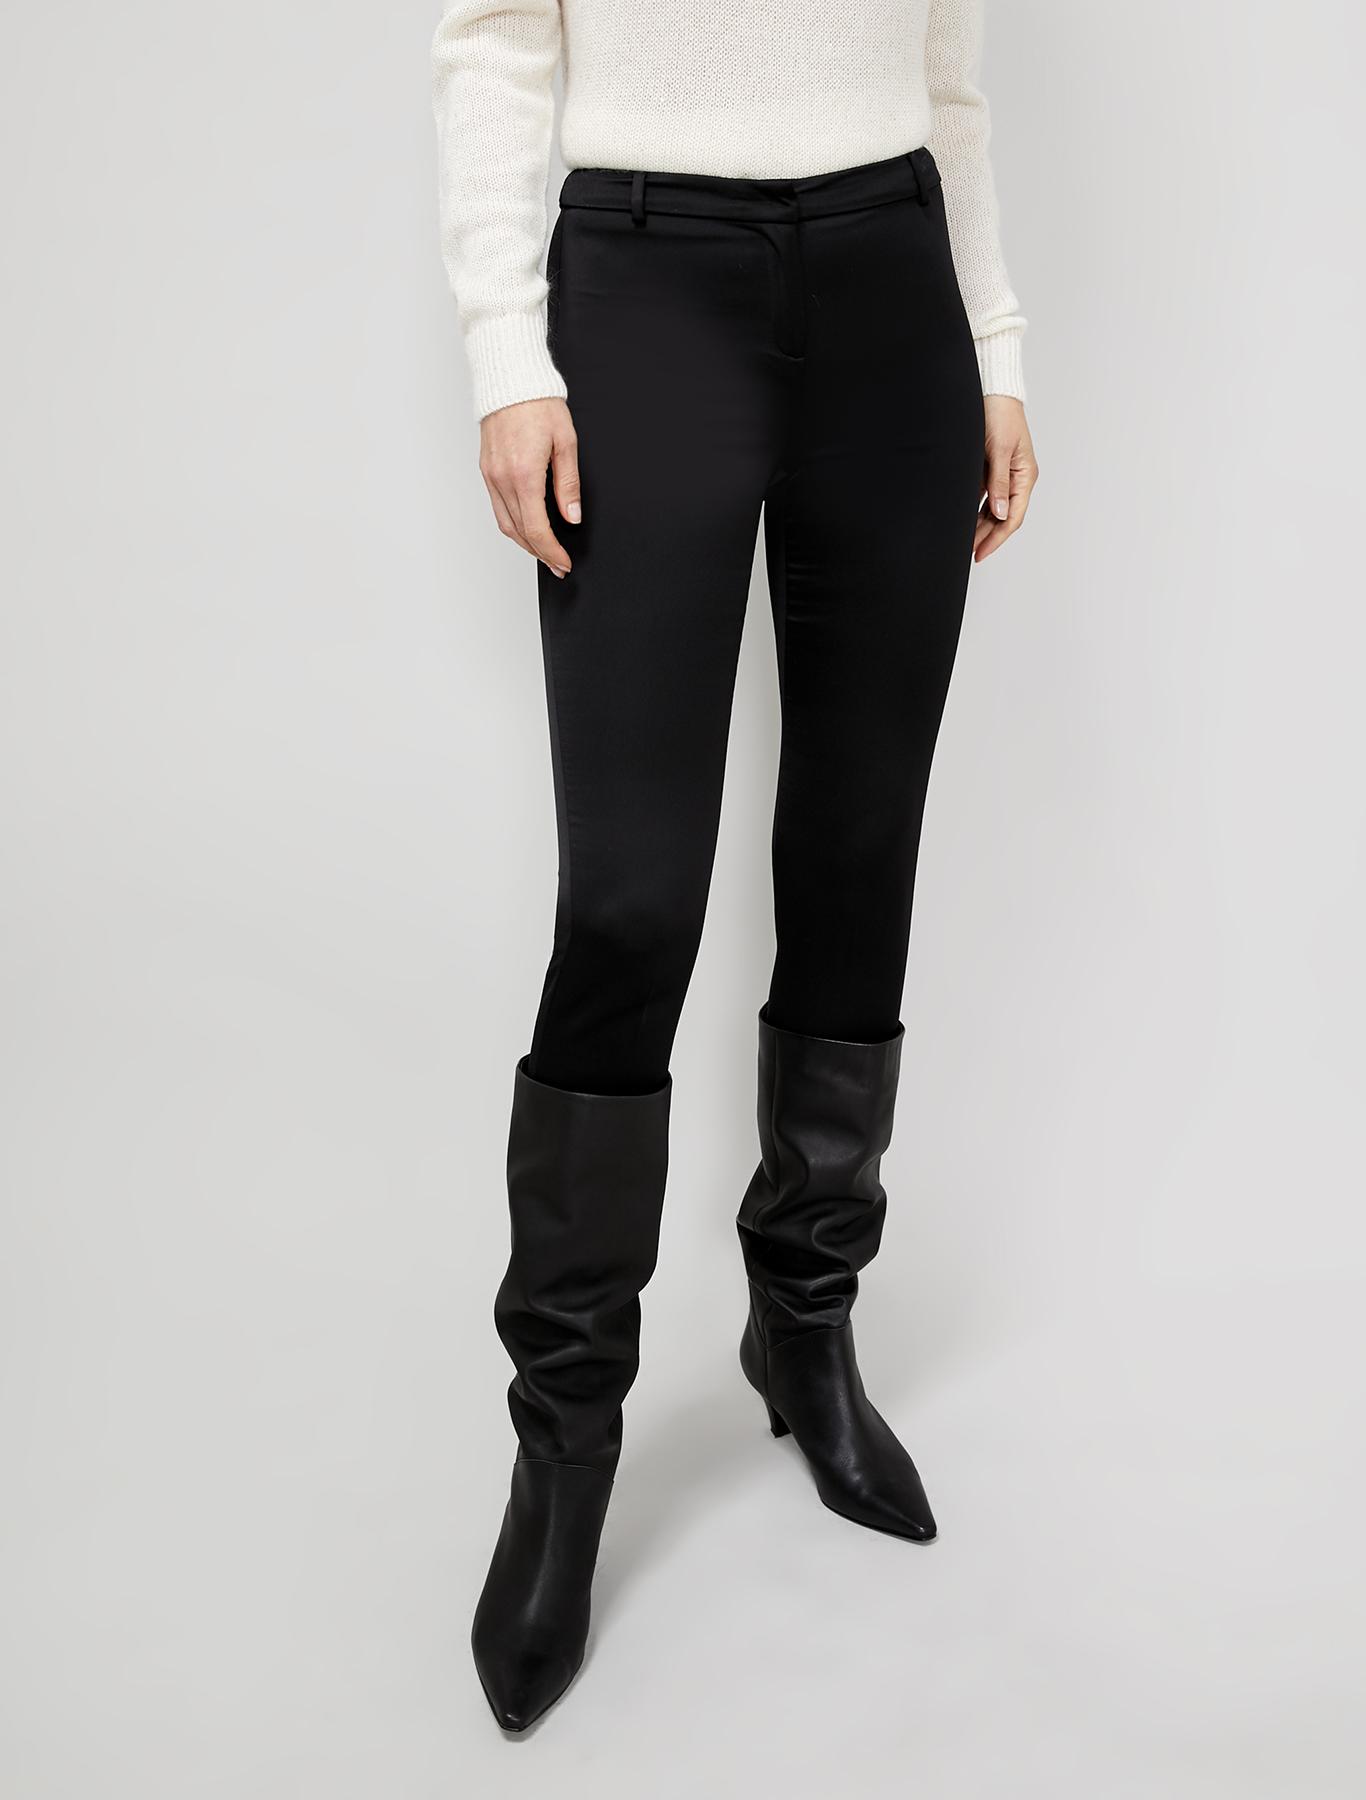 Envers satin trousers - black - pennyblack